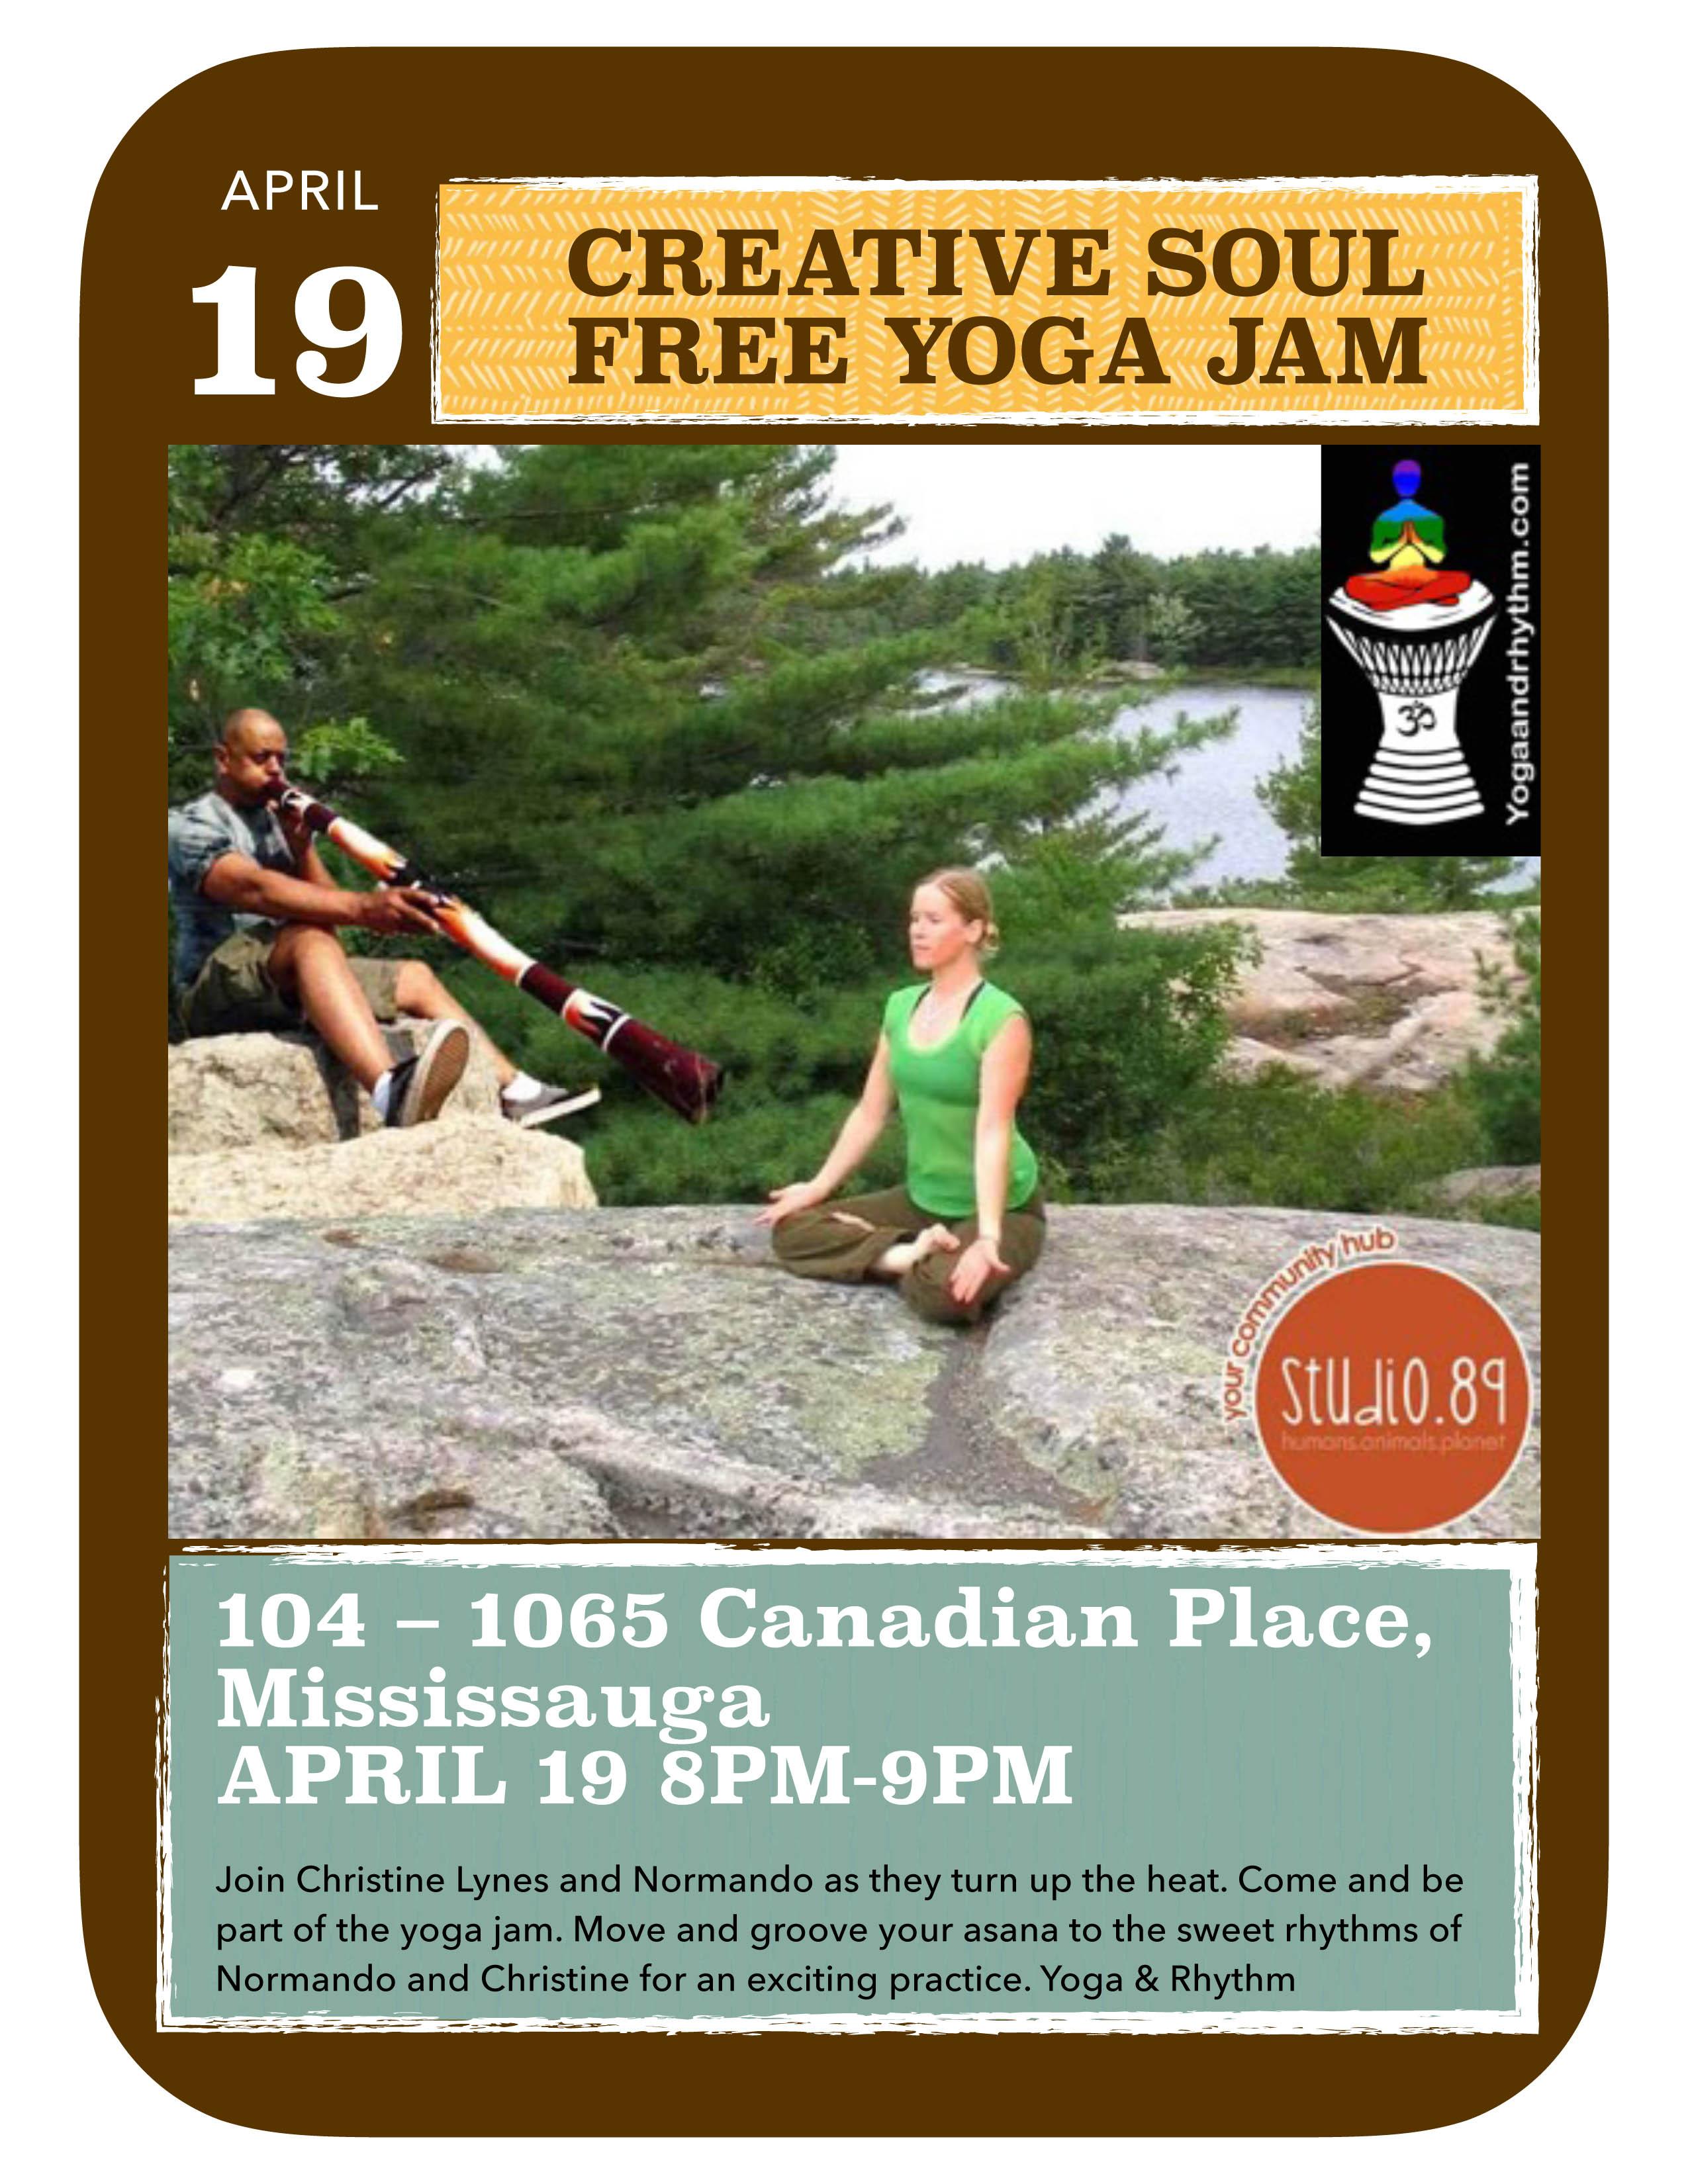 Creative Soul Free Yoga Jam